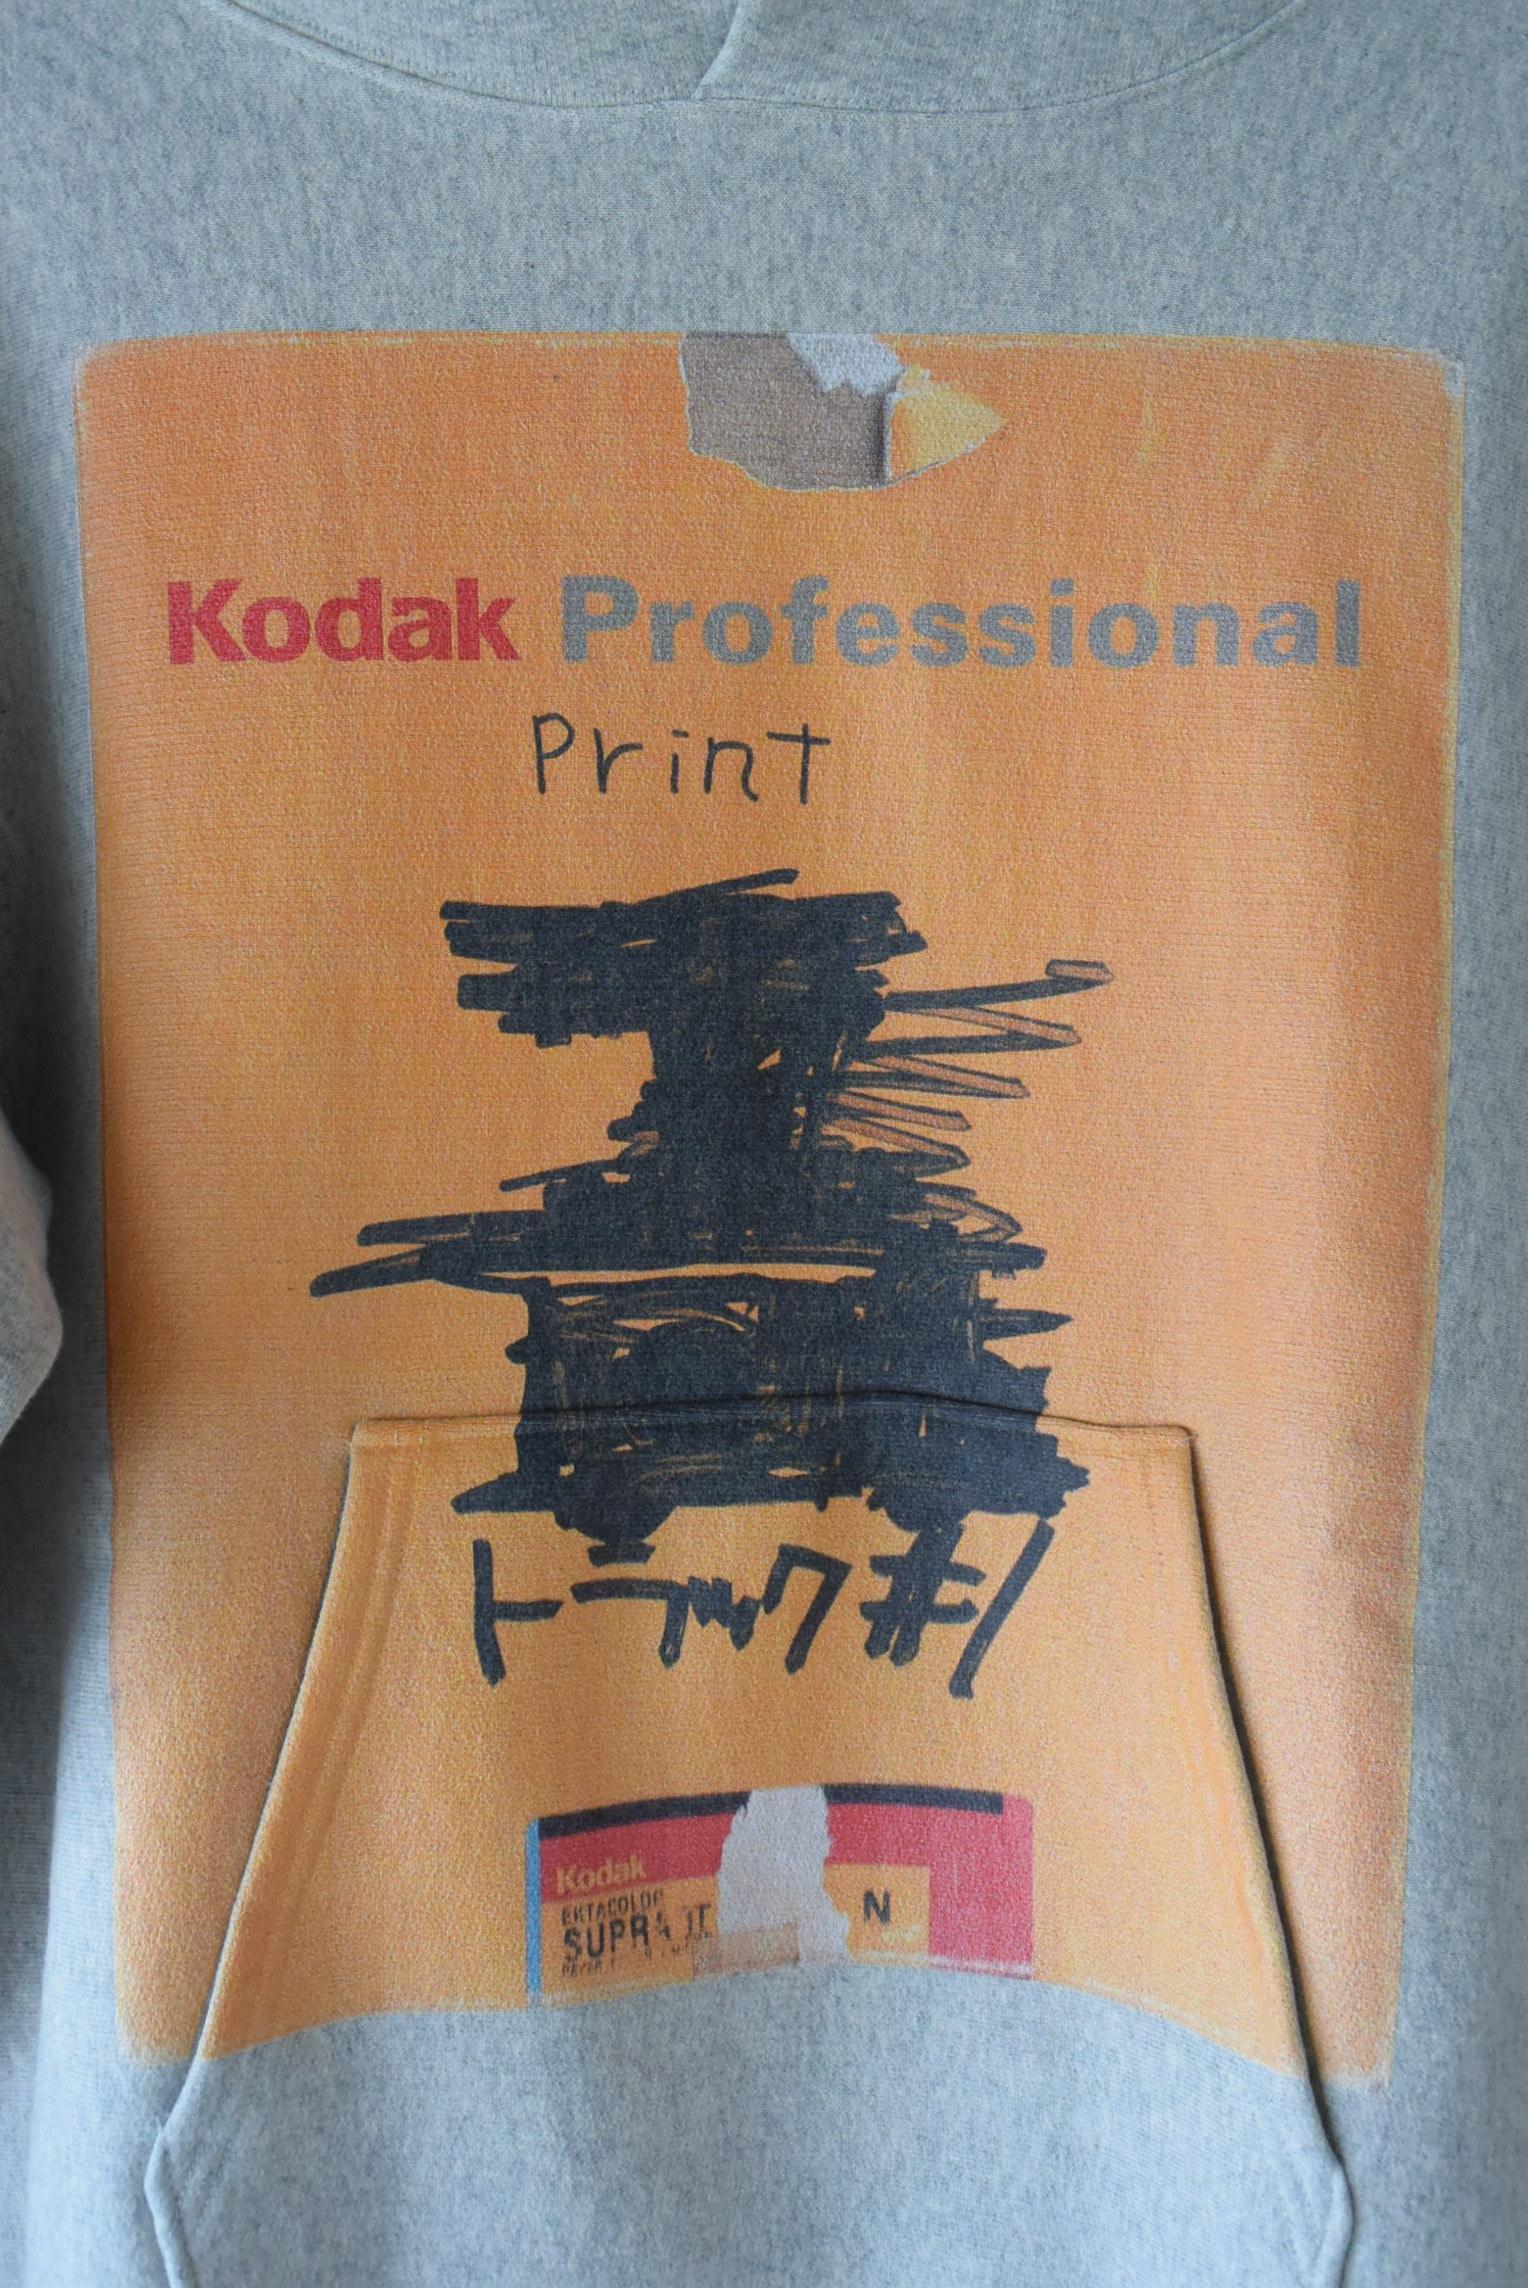 TACOMA FUJI RECORDS PRINT BOX by Masaru Tatsuki